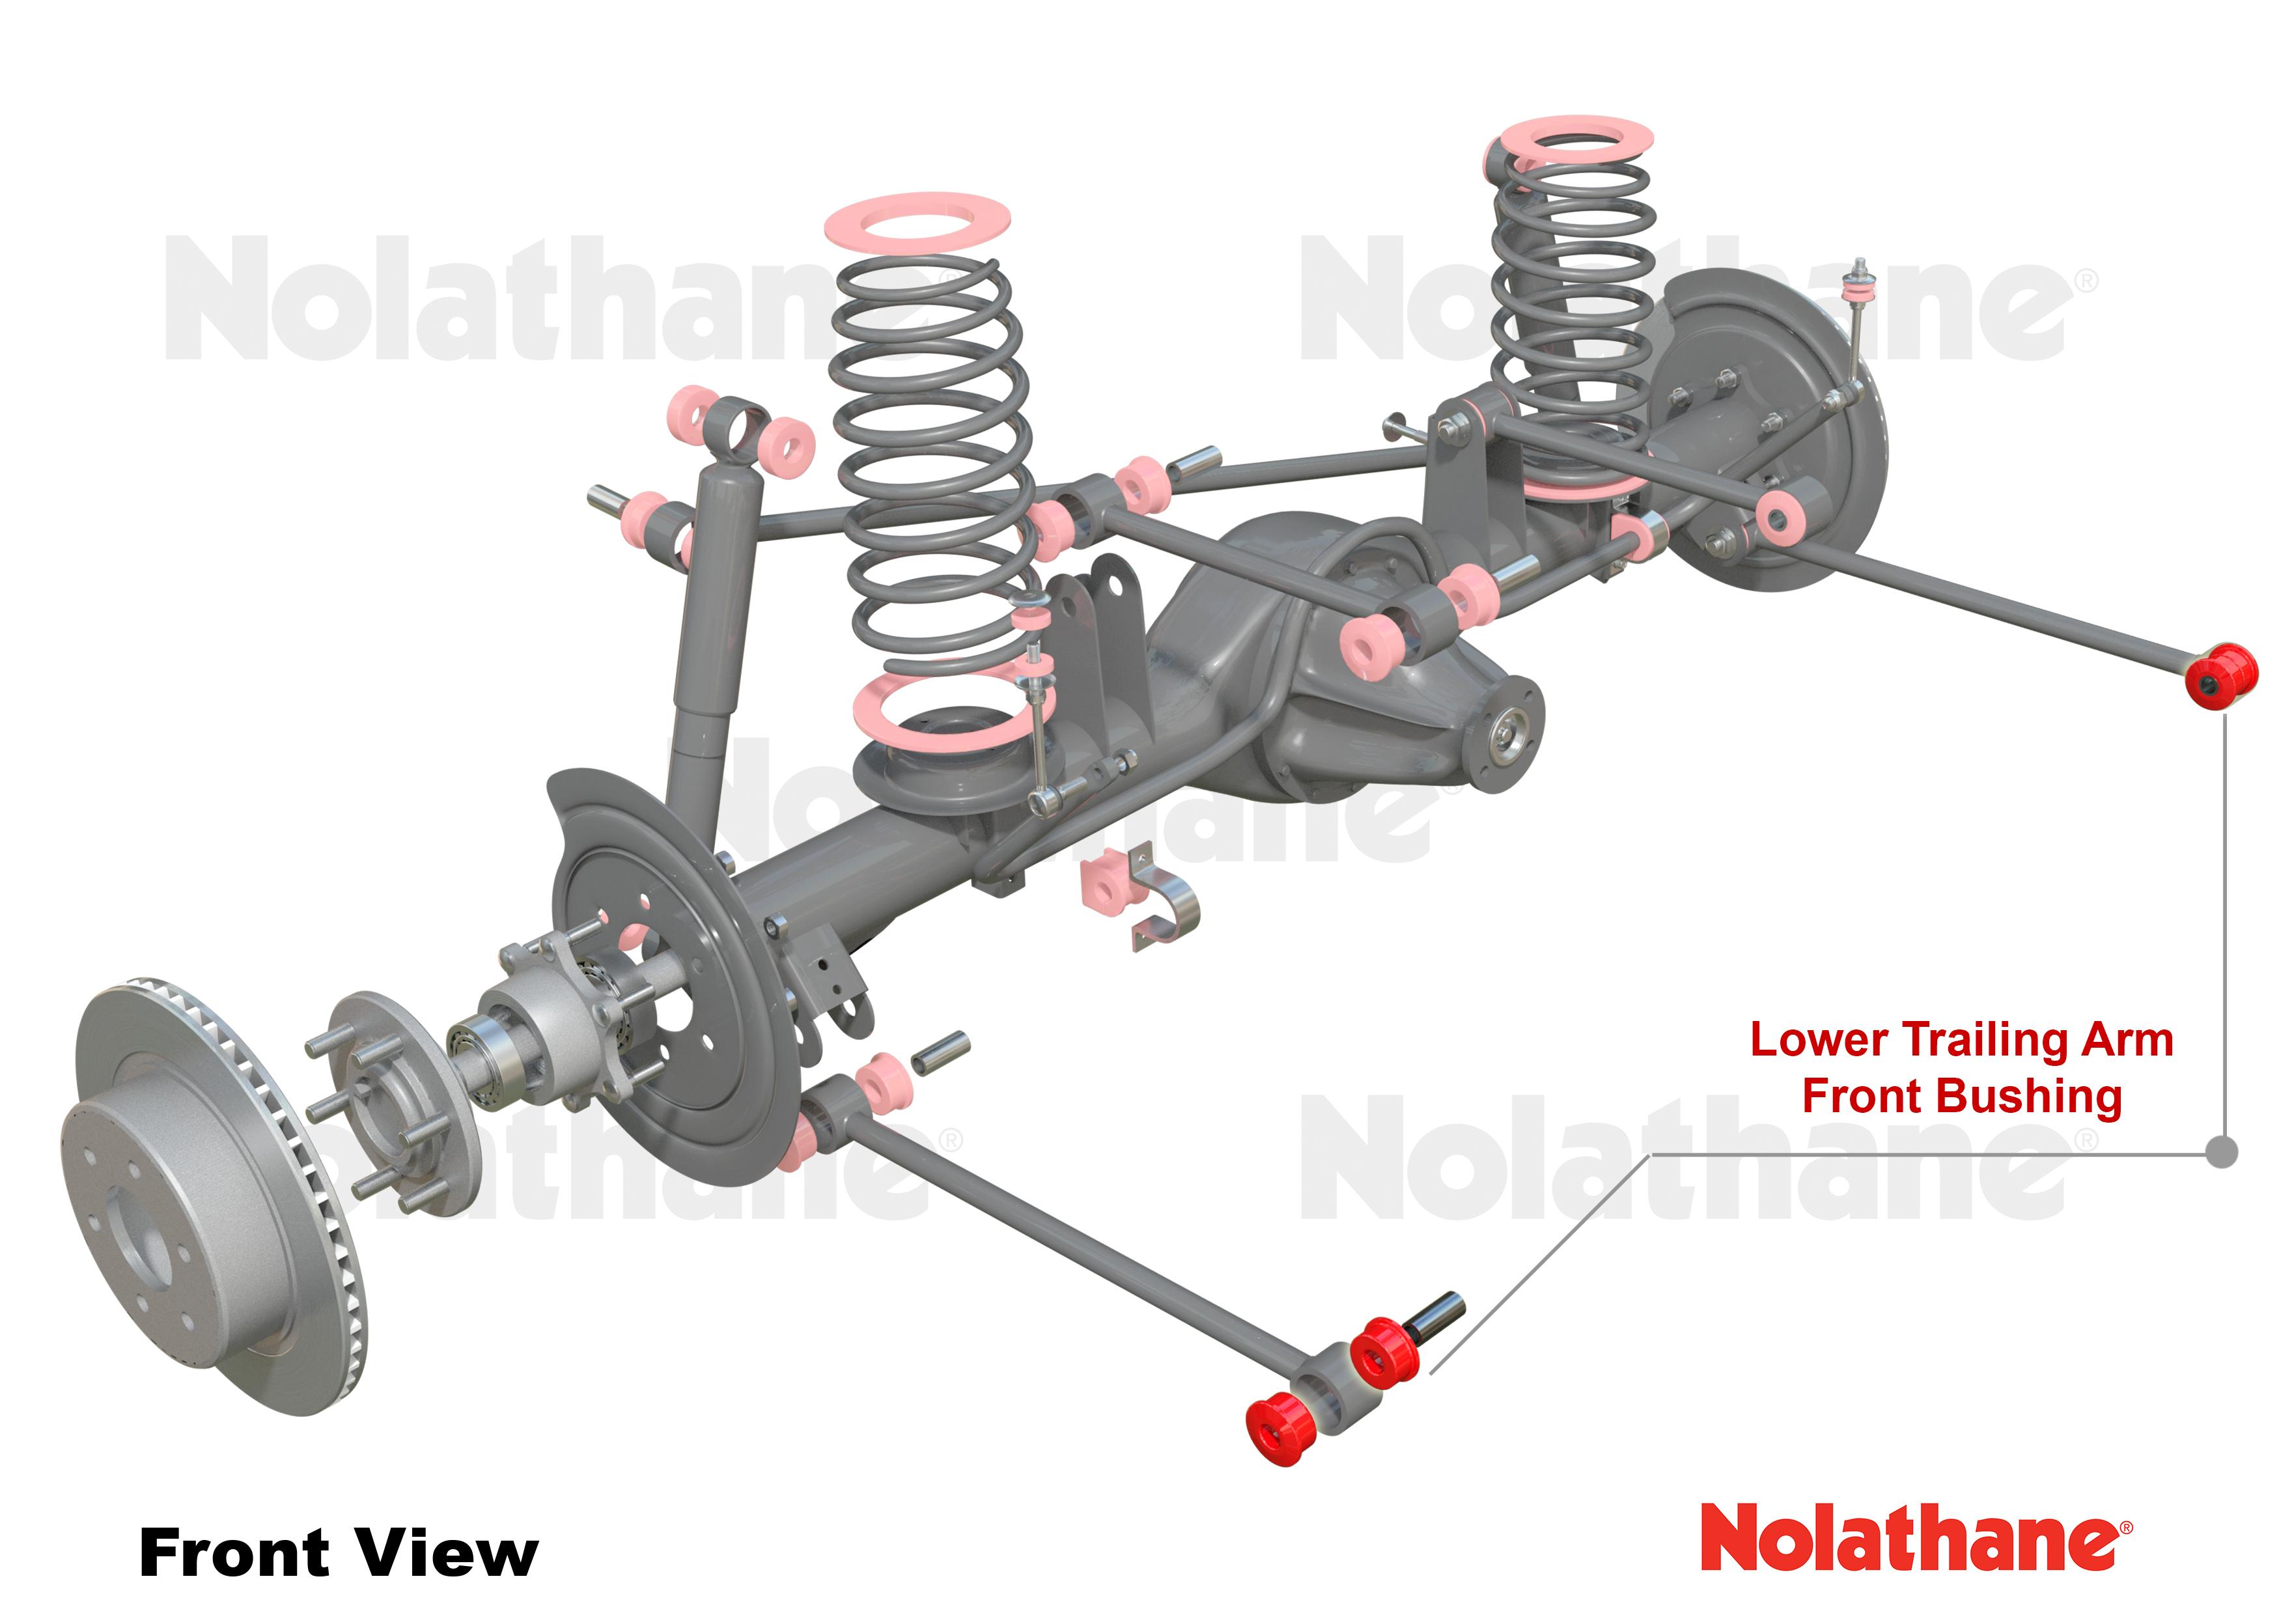 Nolathane Rear Trailing arm lower front bushing